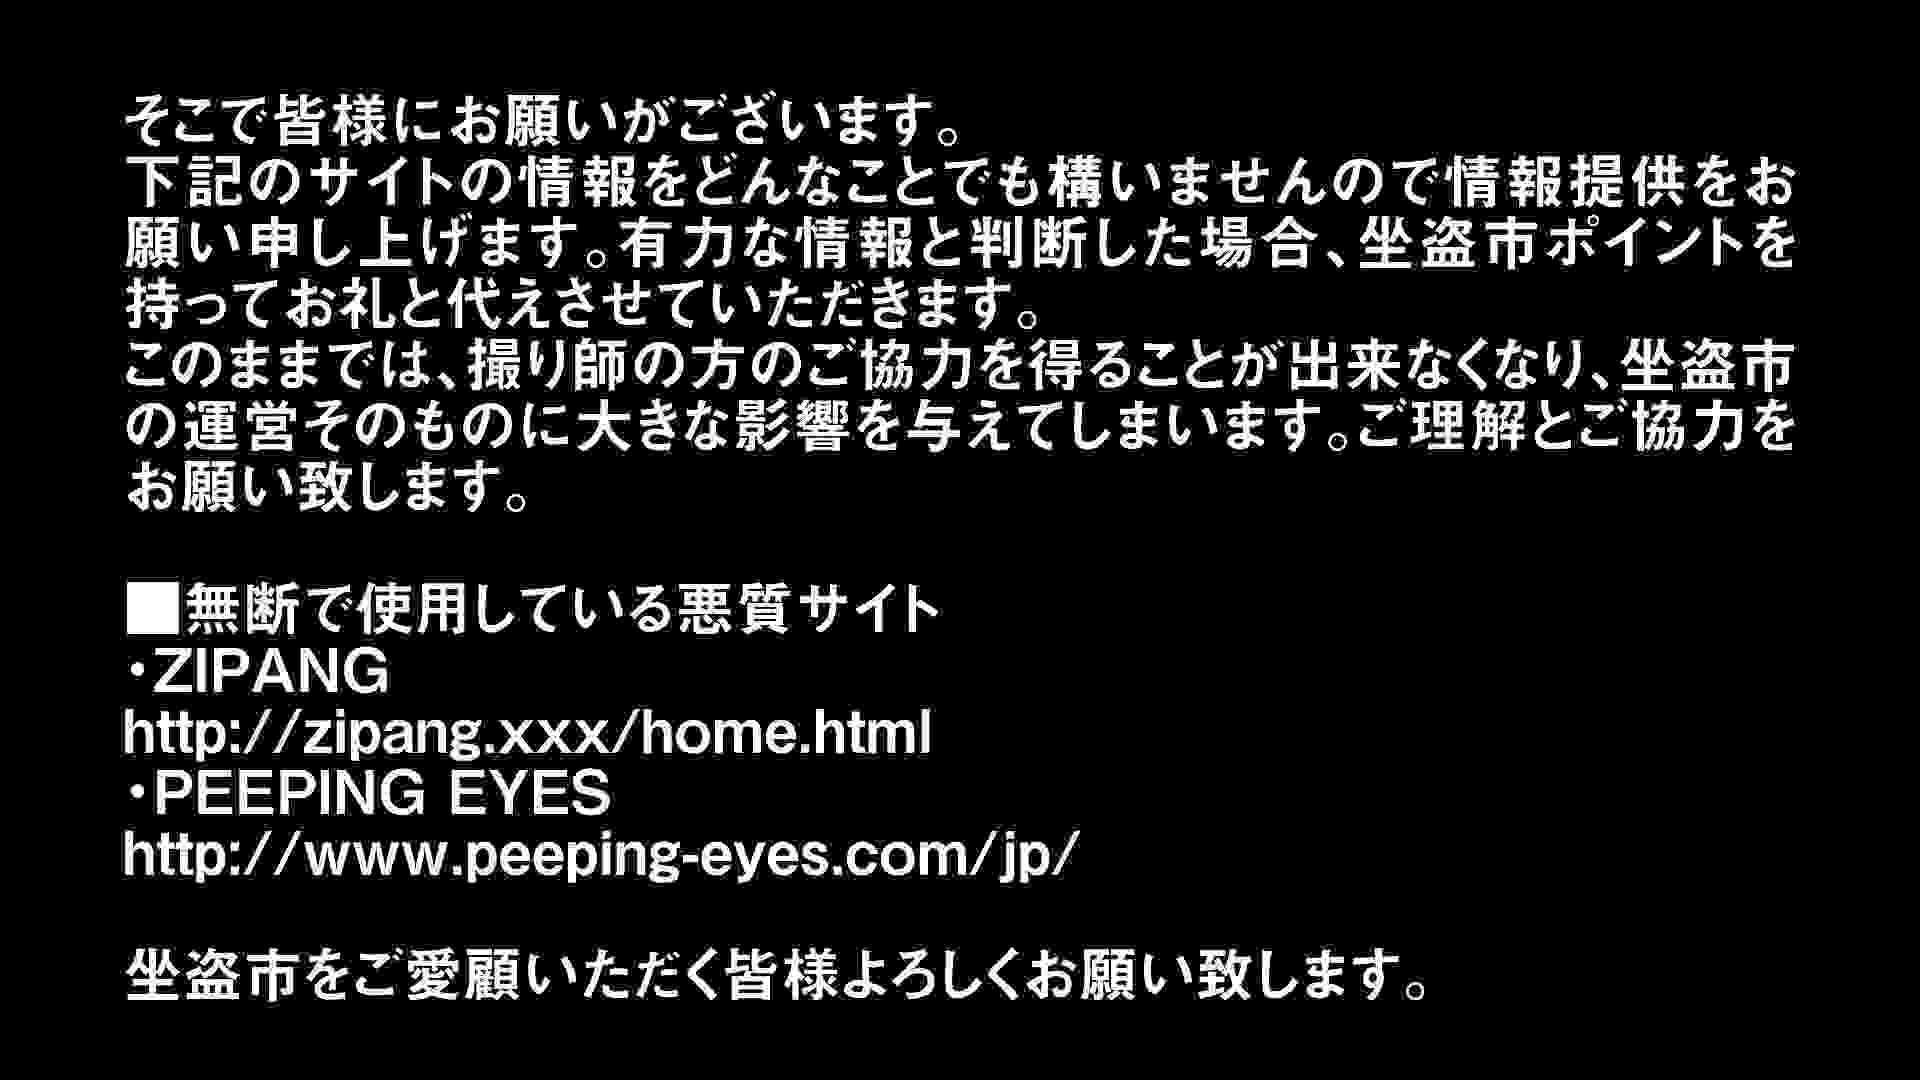 Aquaな露天風呂Vol.300 盗撮シリーズ | 露天風呂編  110PIX 45